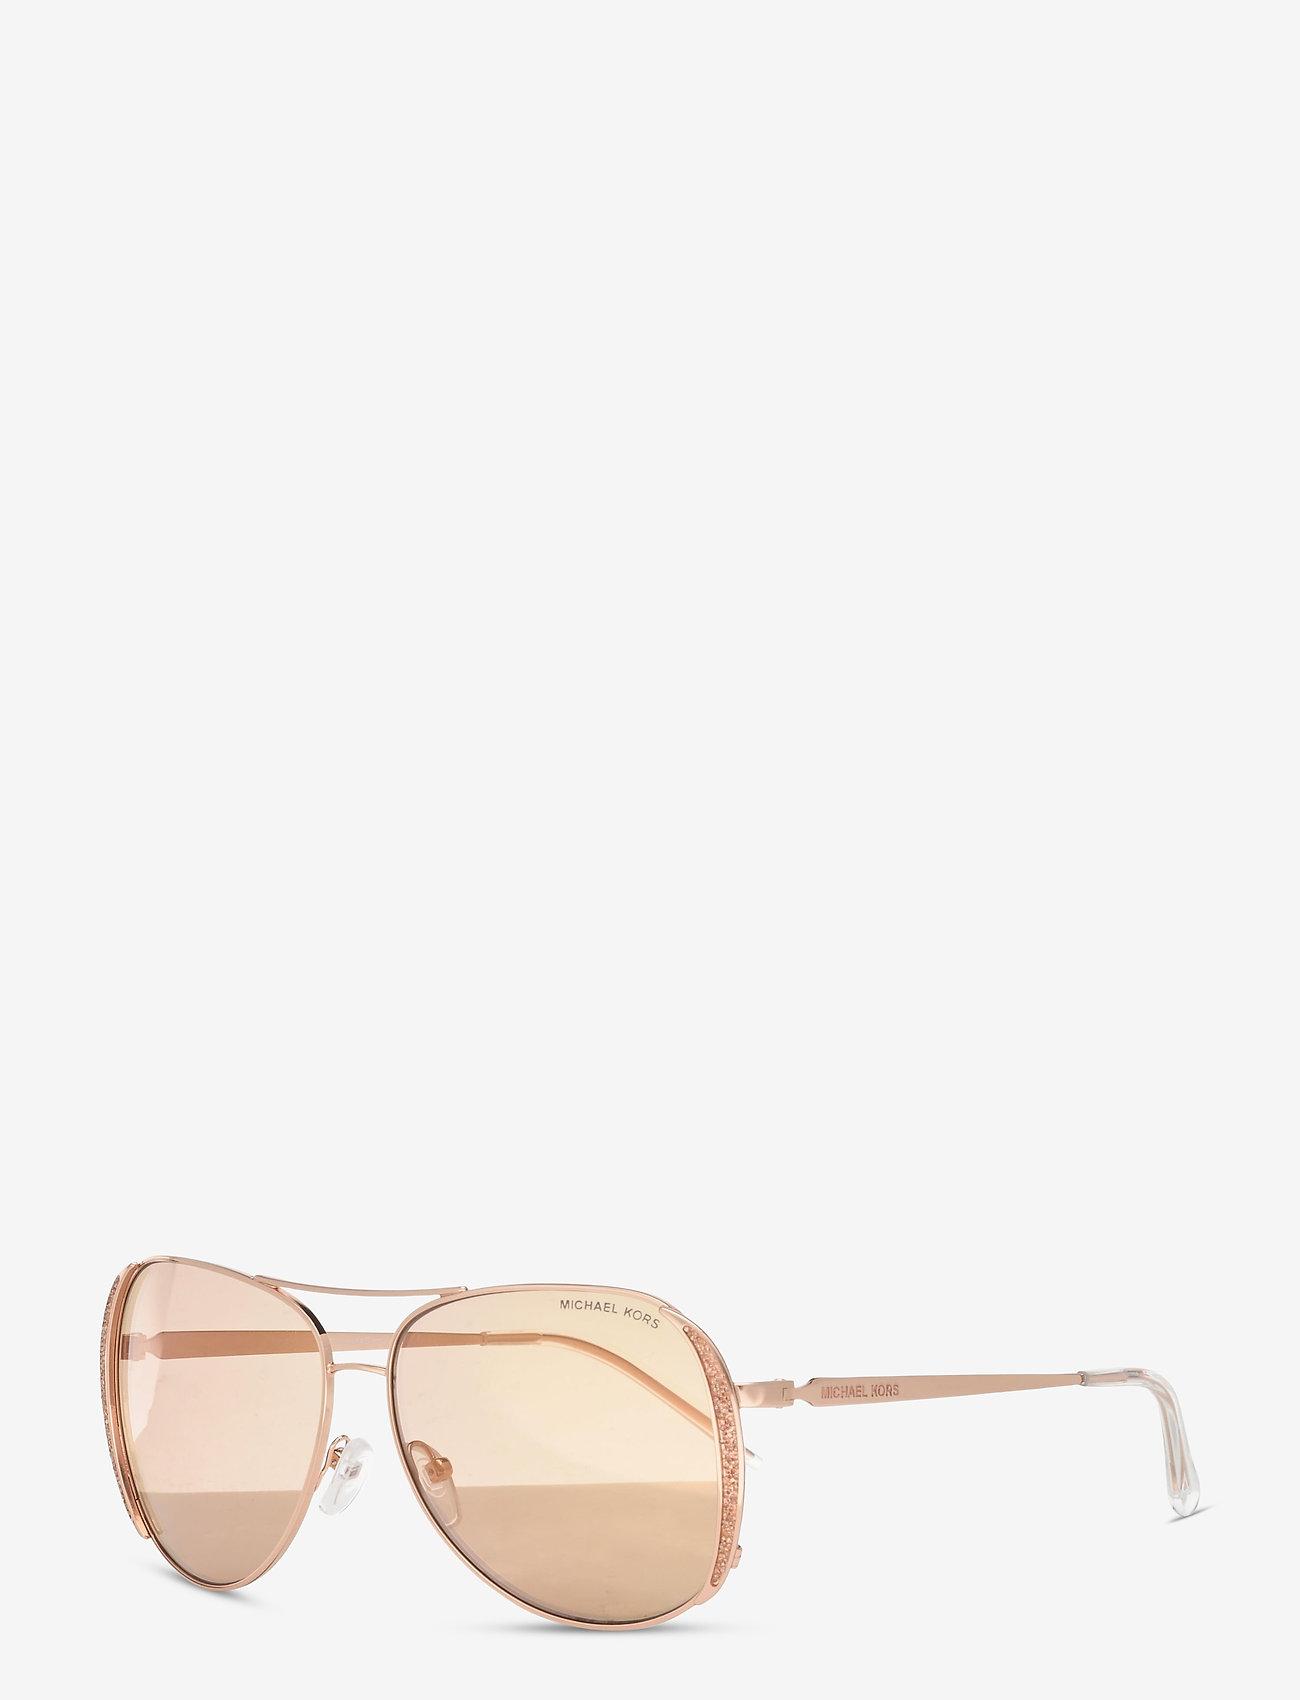 Michael Kors Sunglasses - CHELSEA GLAM - pilot - rose gold flash - 1